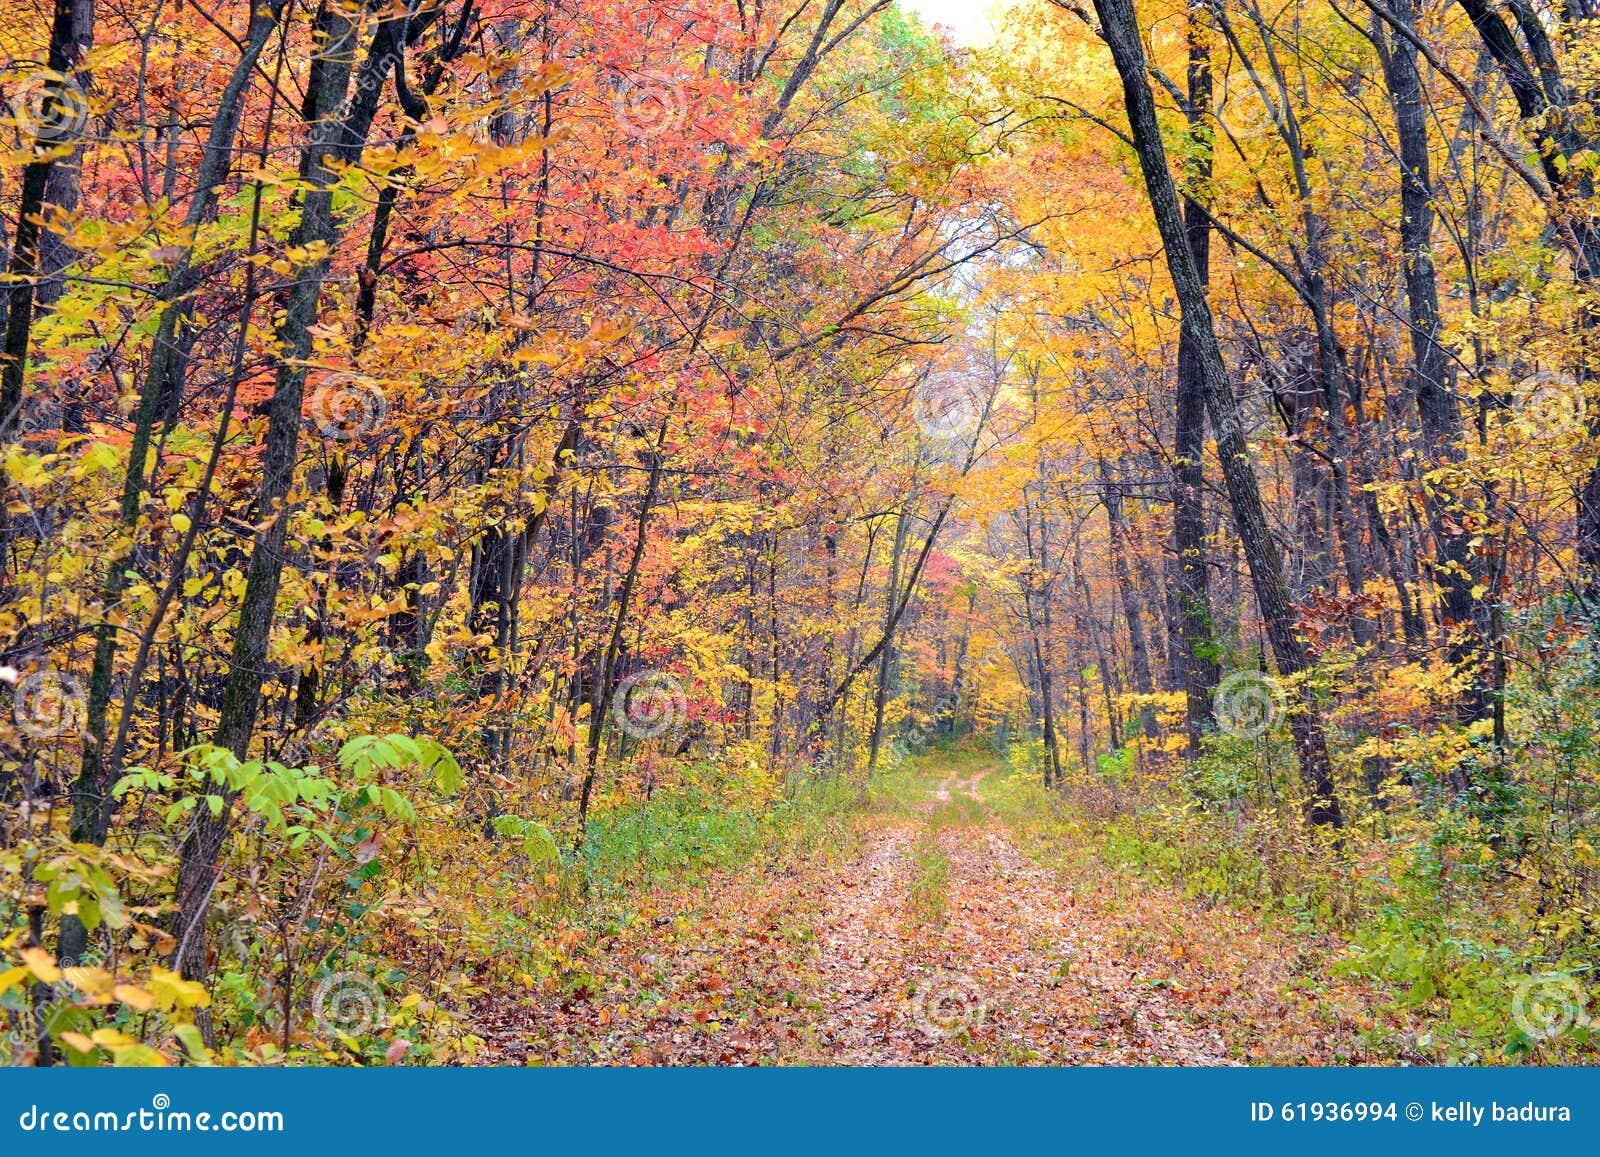 La hoja del otoño cubrió la trayectoria a través del bosque